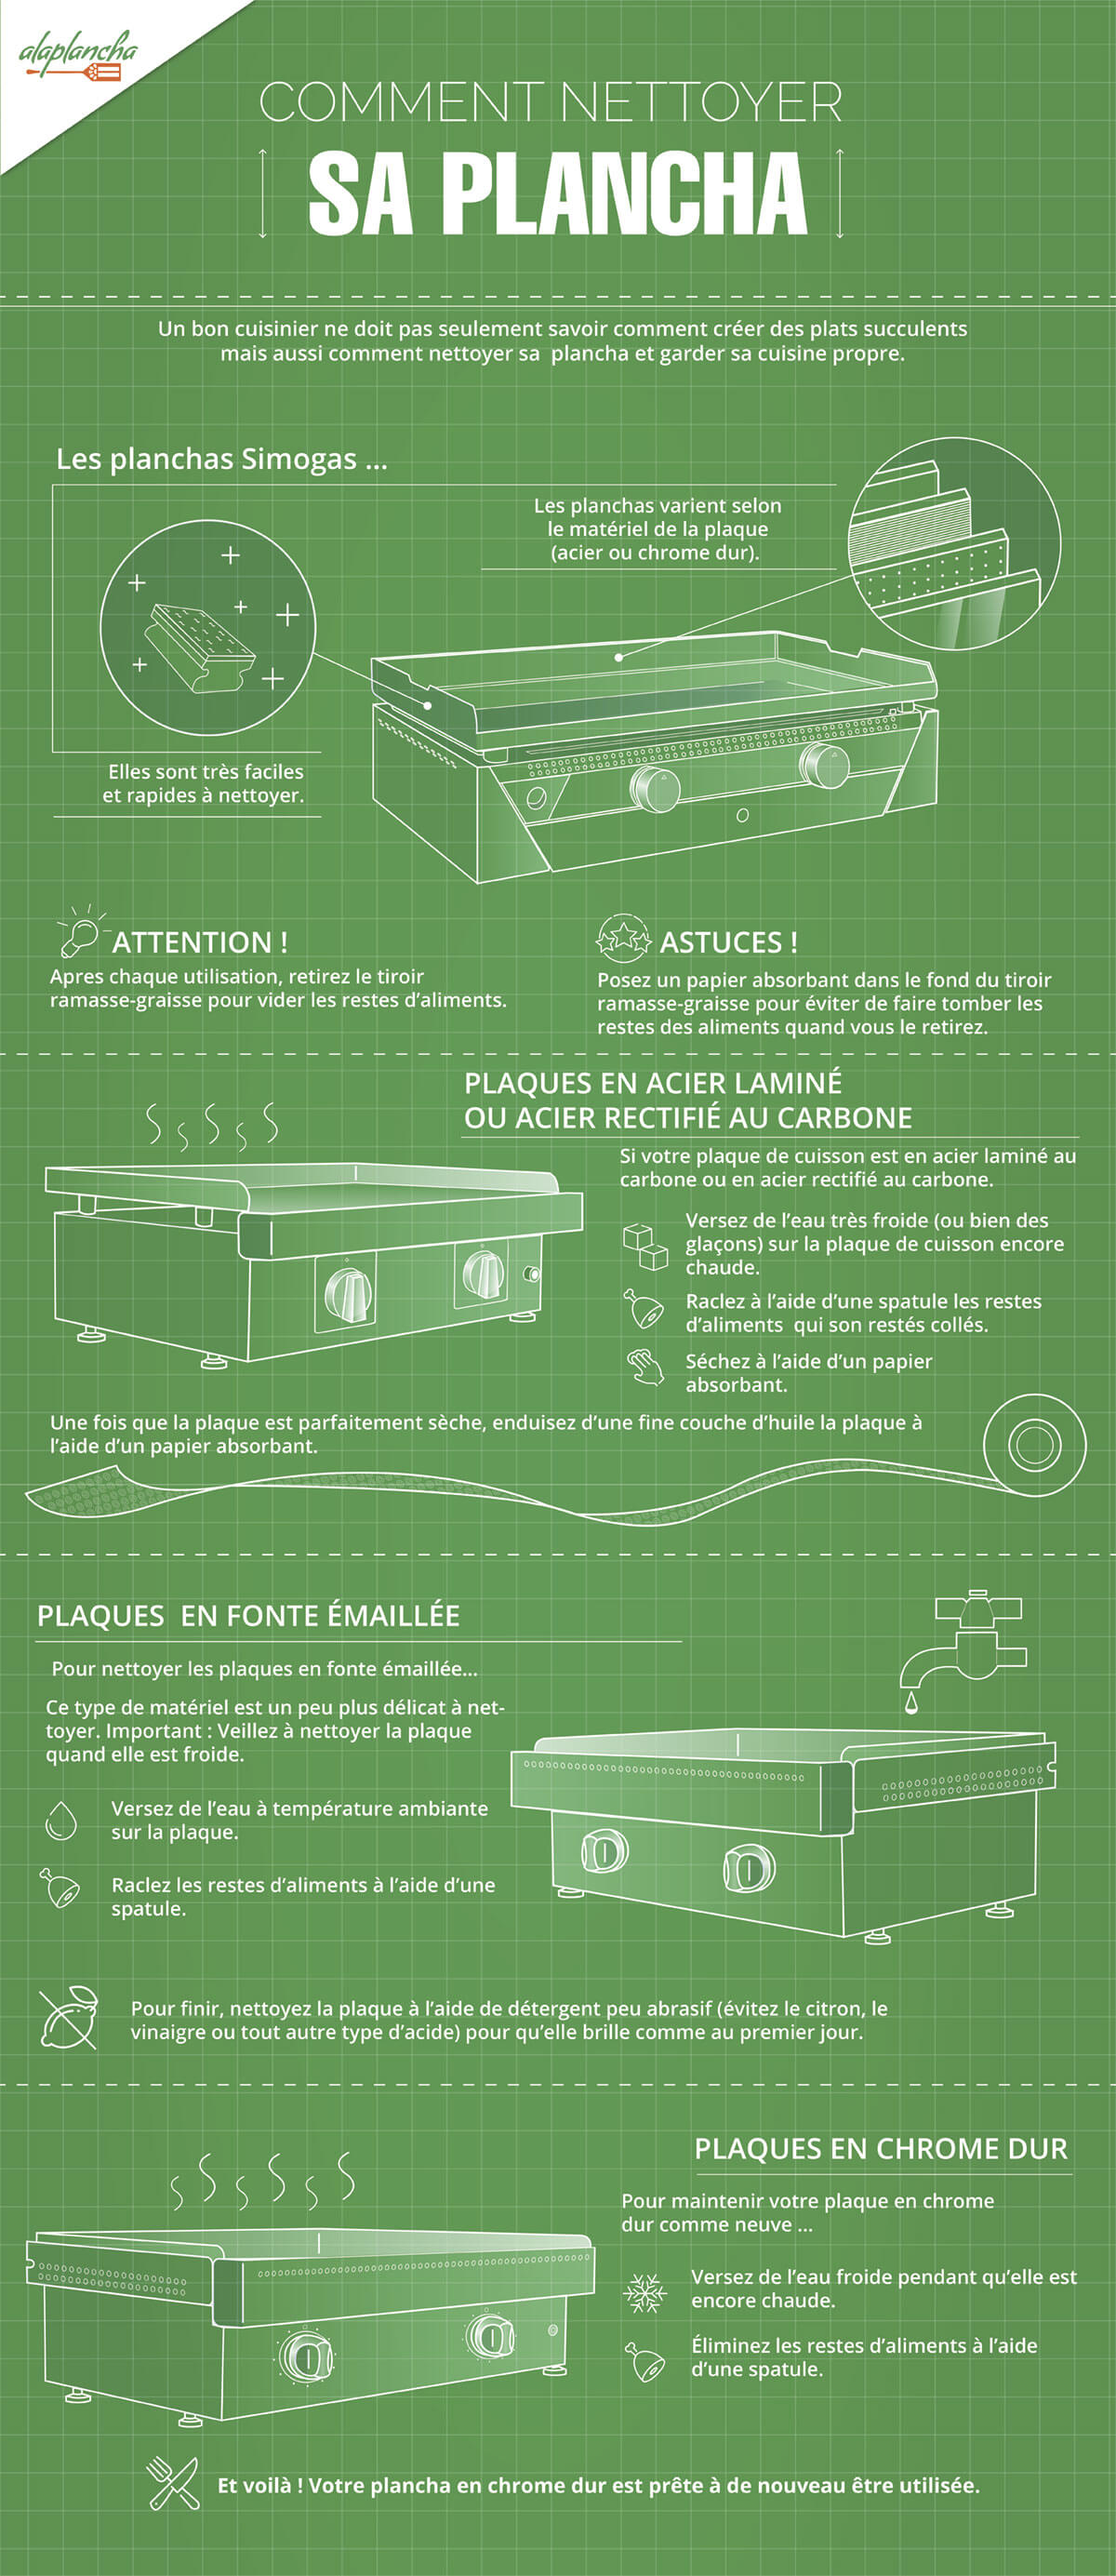 Comment nettoyer les planchas Simogas - Infografia